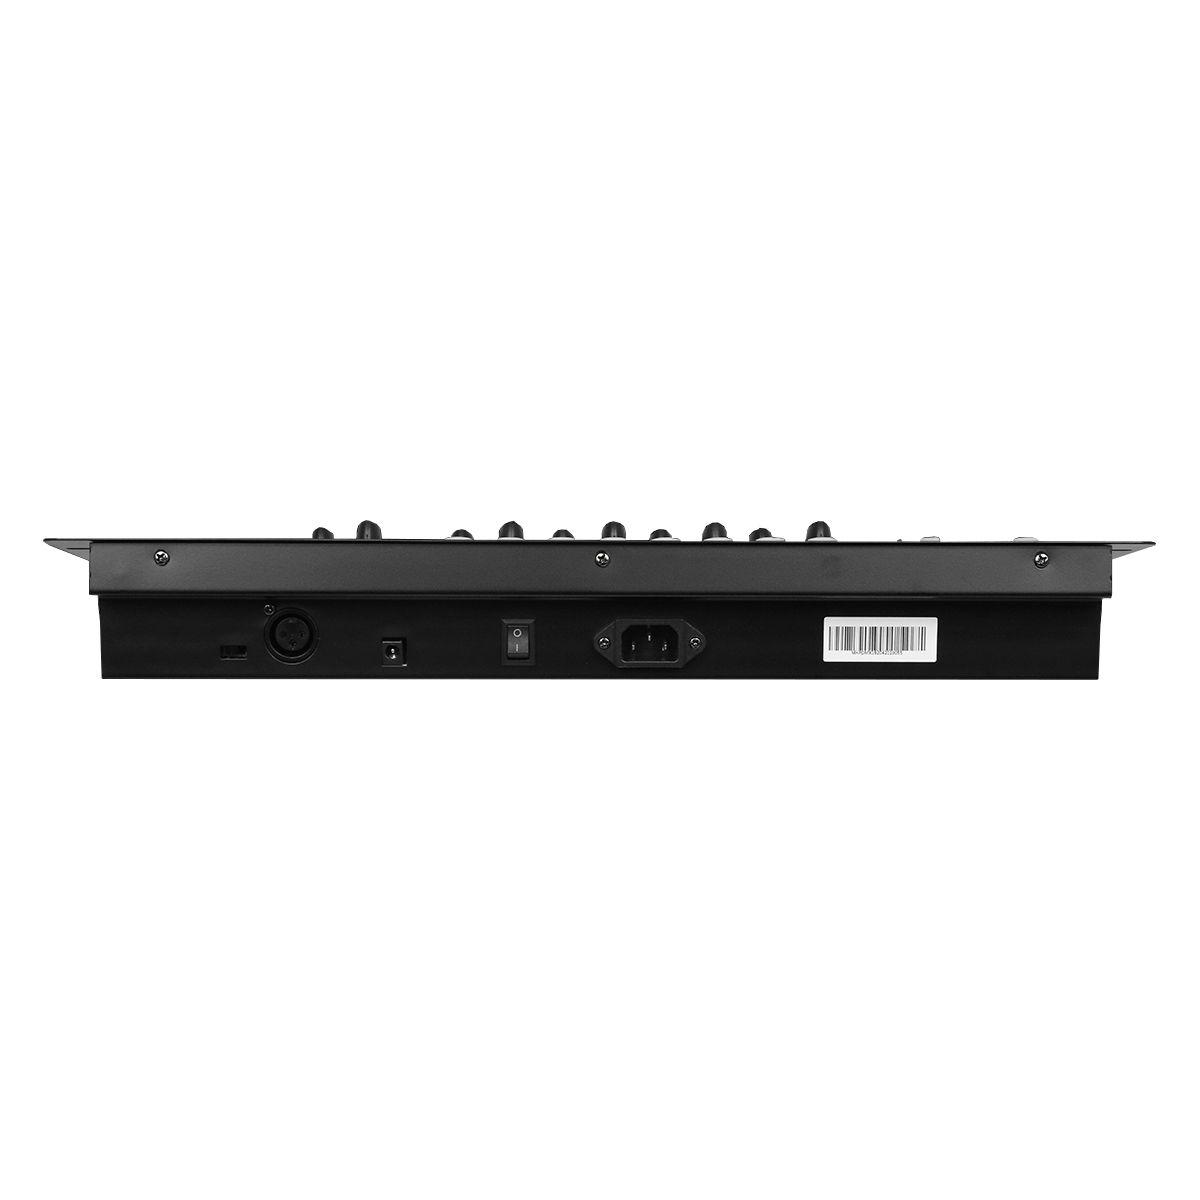 Mesa DMX Iluminação Controller MKP-DMX192